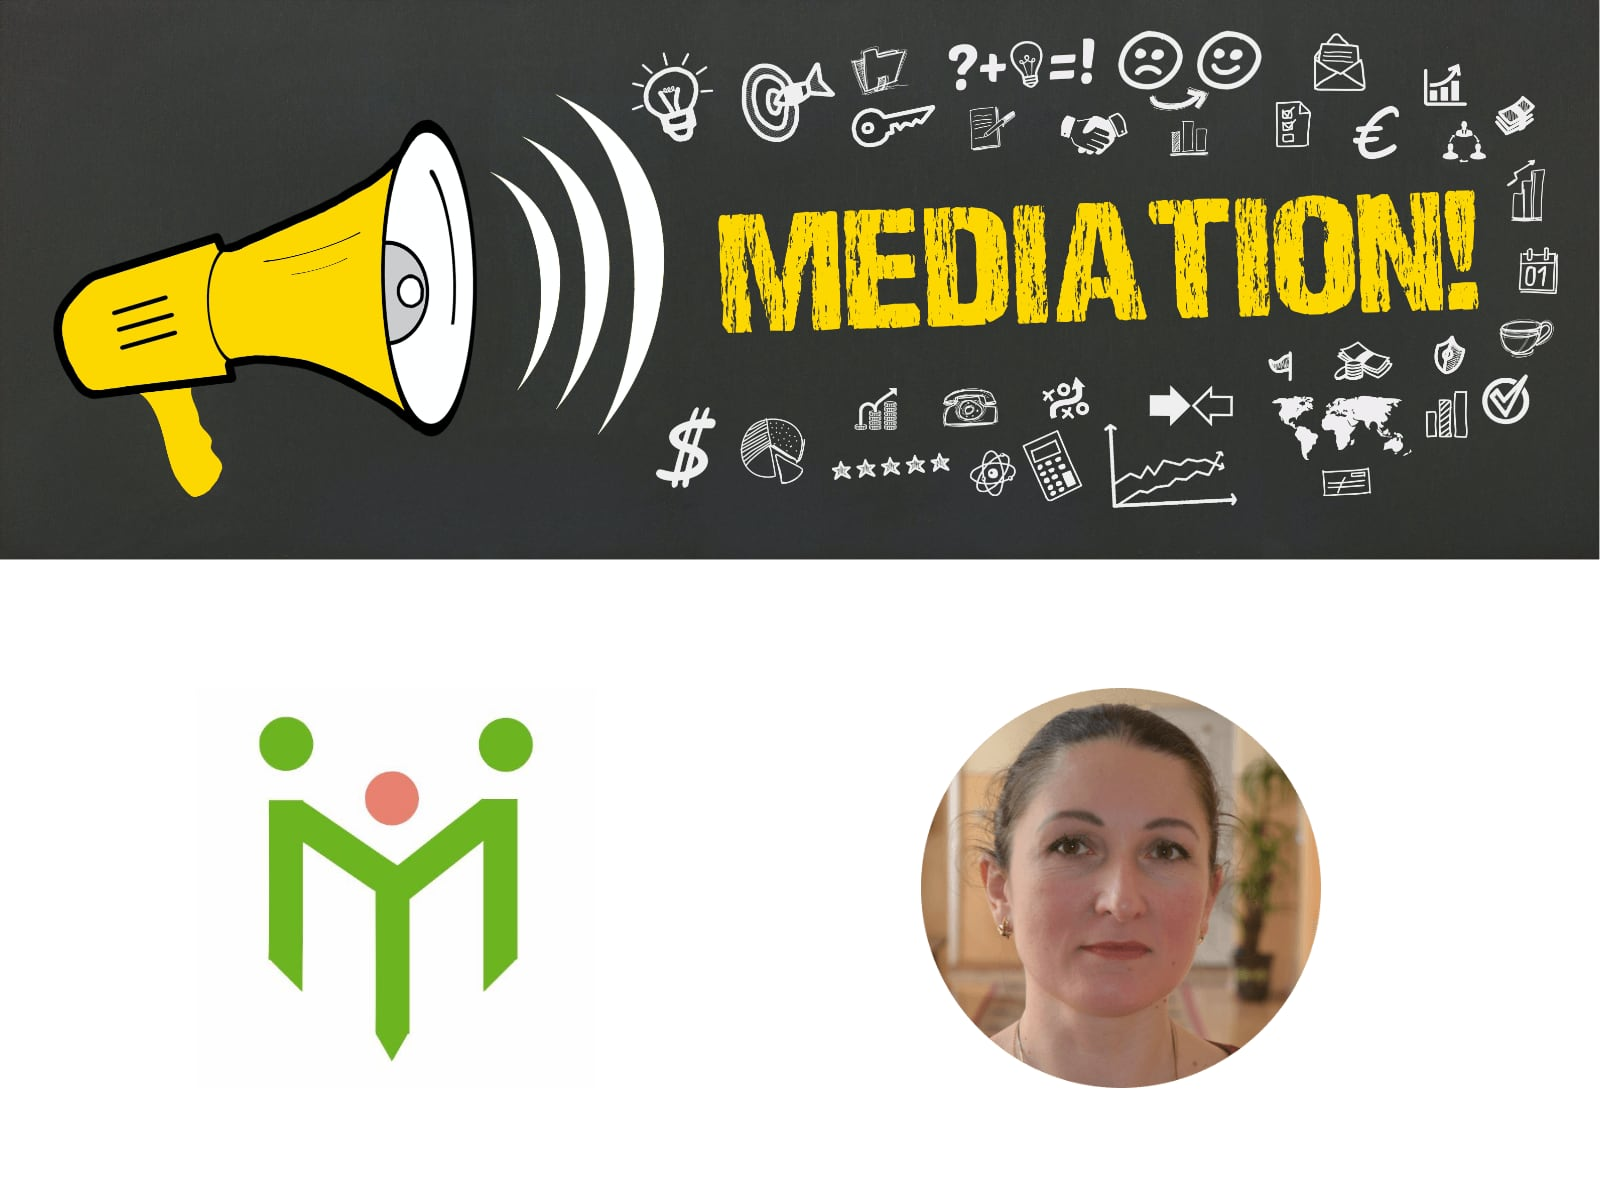 Promoting the benefits of mediation Lidiia Nesterenko